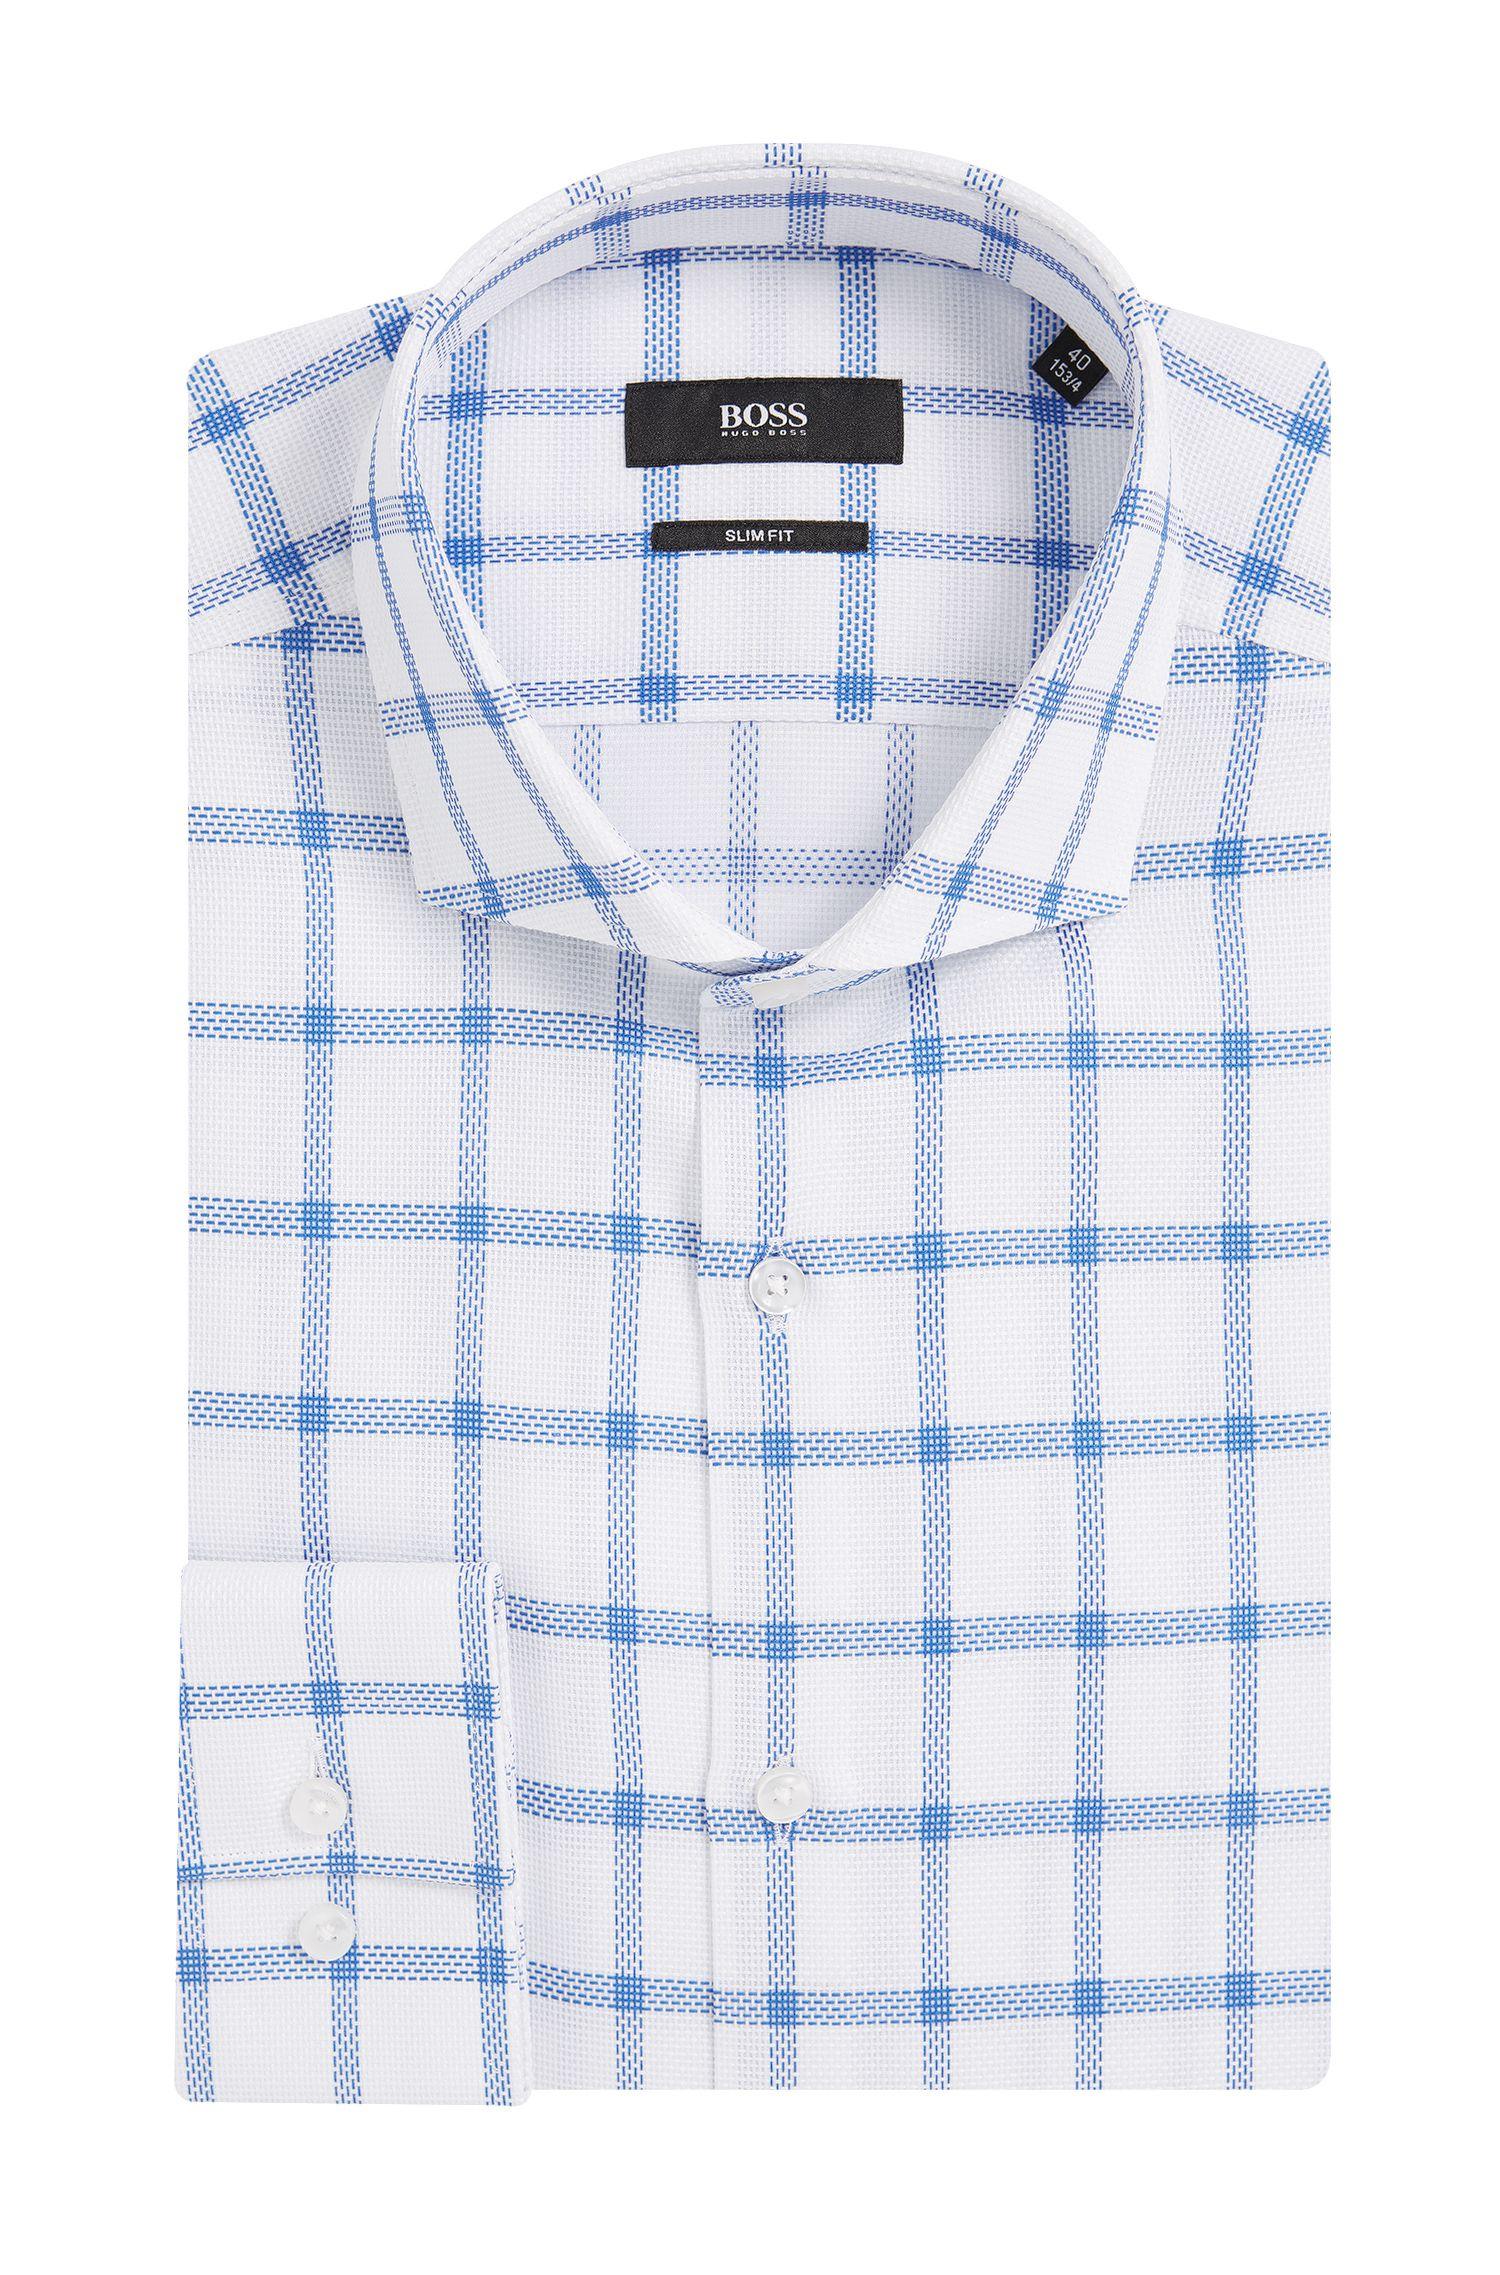 Windowpane Cotton Dress Shirt, Slim Fit   Jason